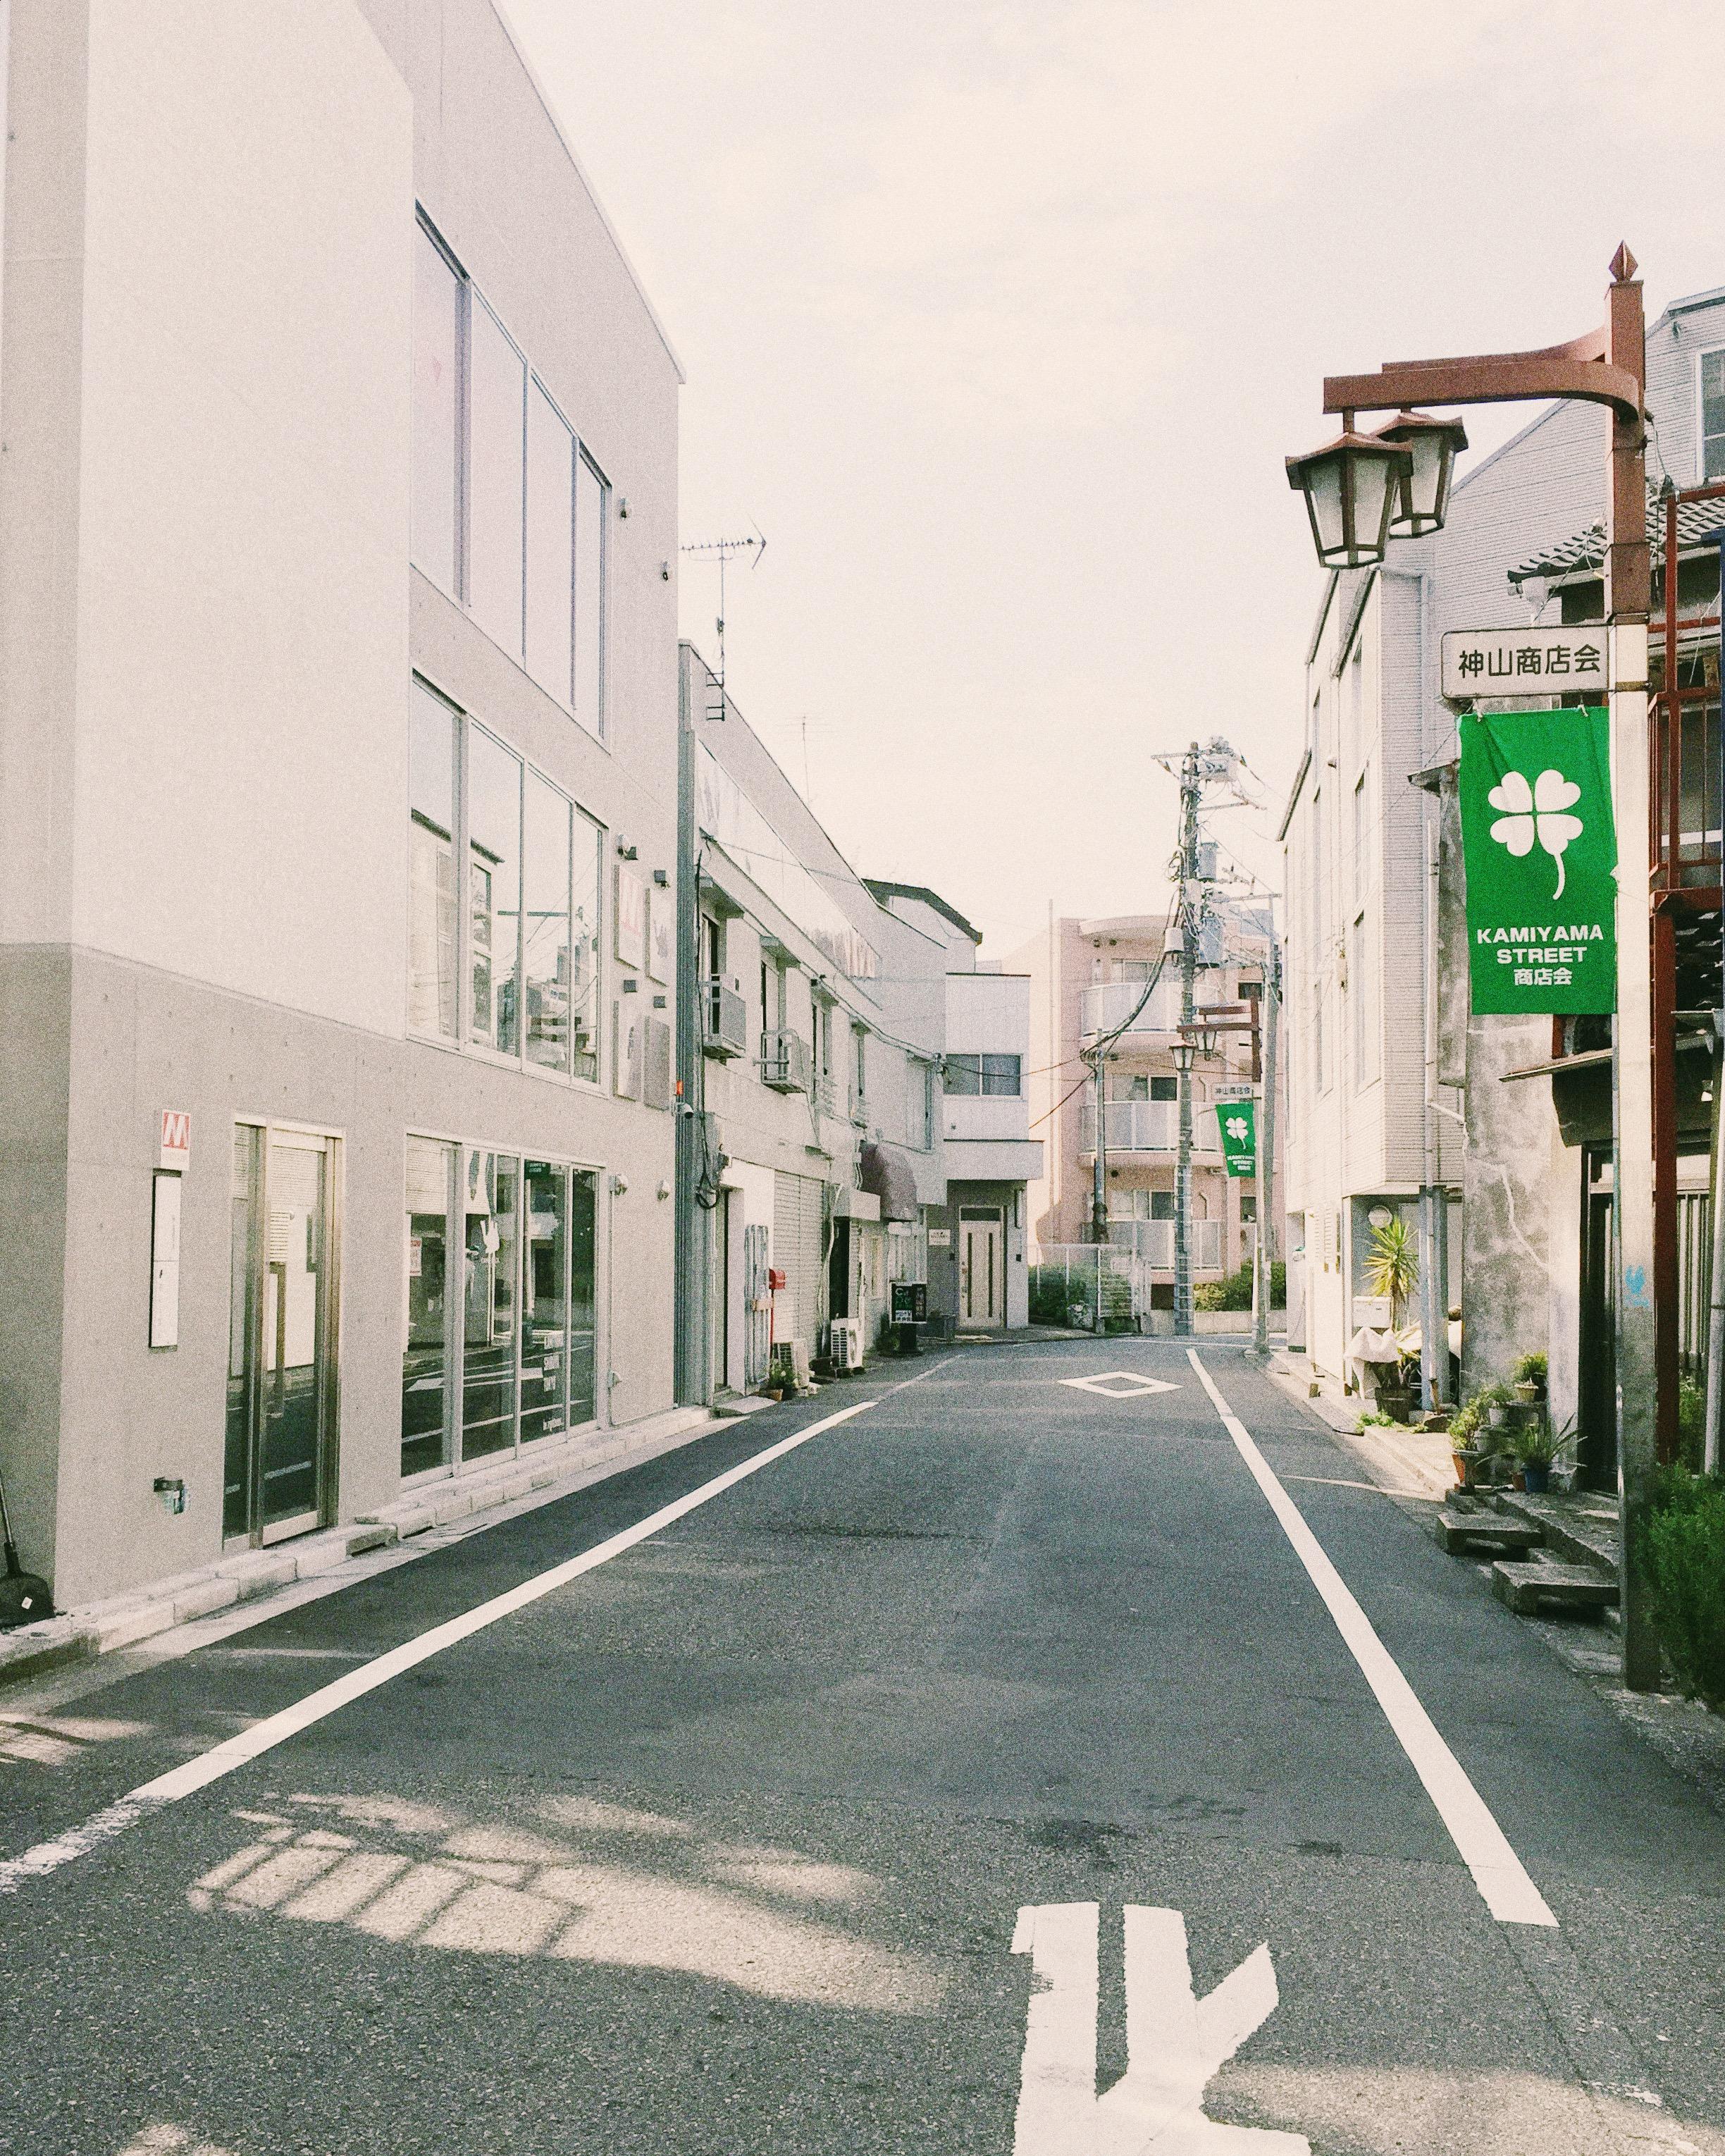 Kamiyama Street, Spring 2015.